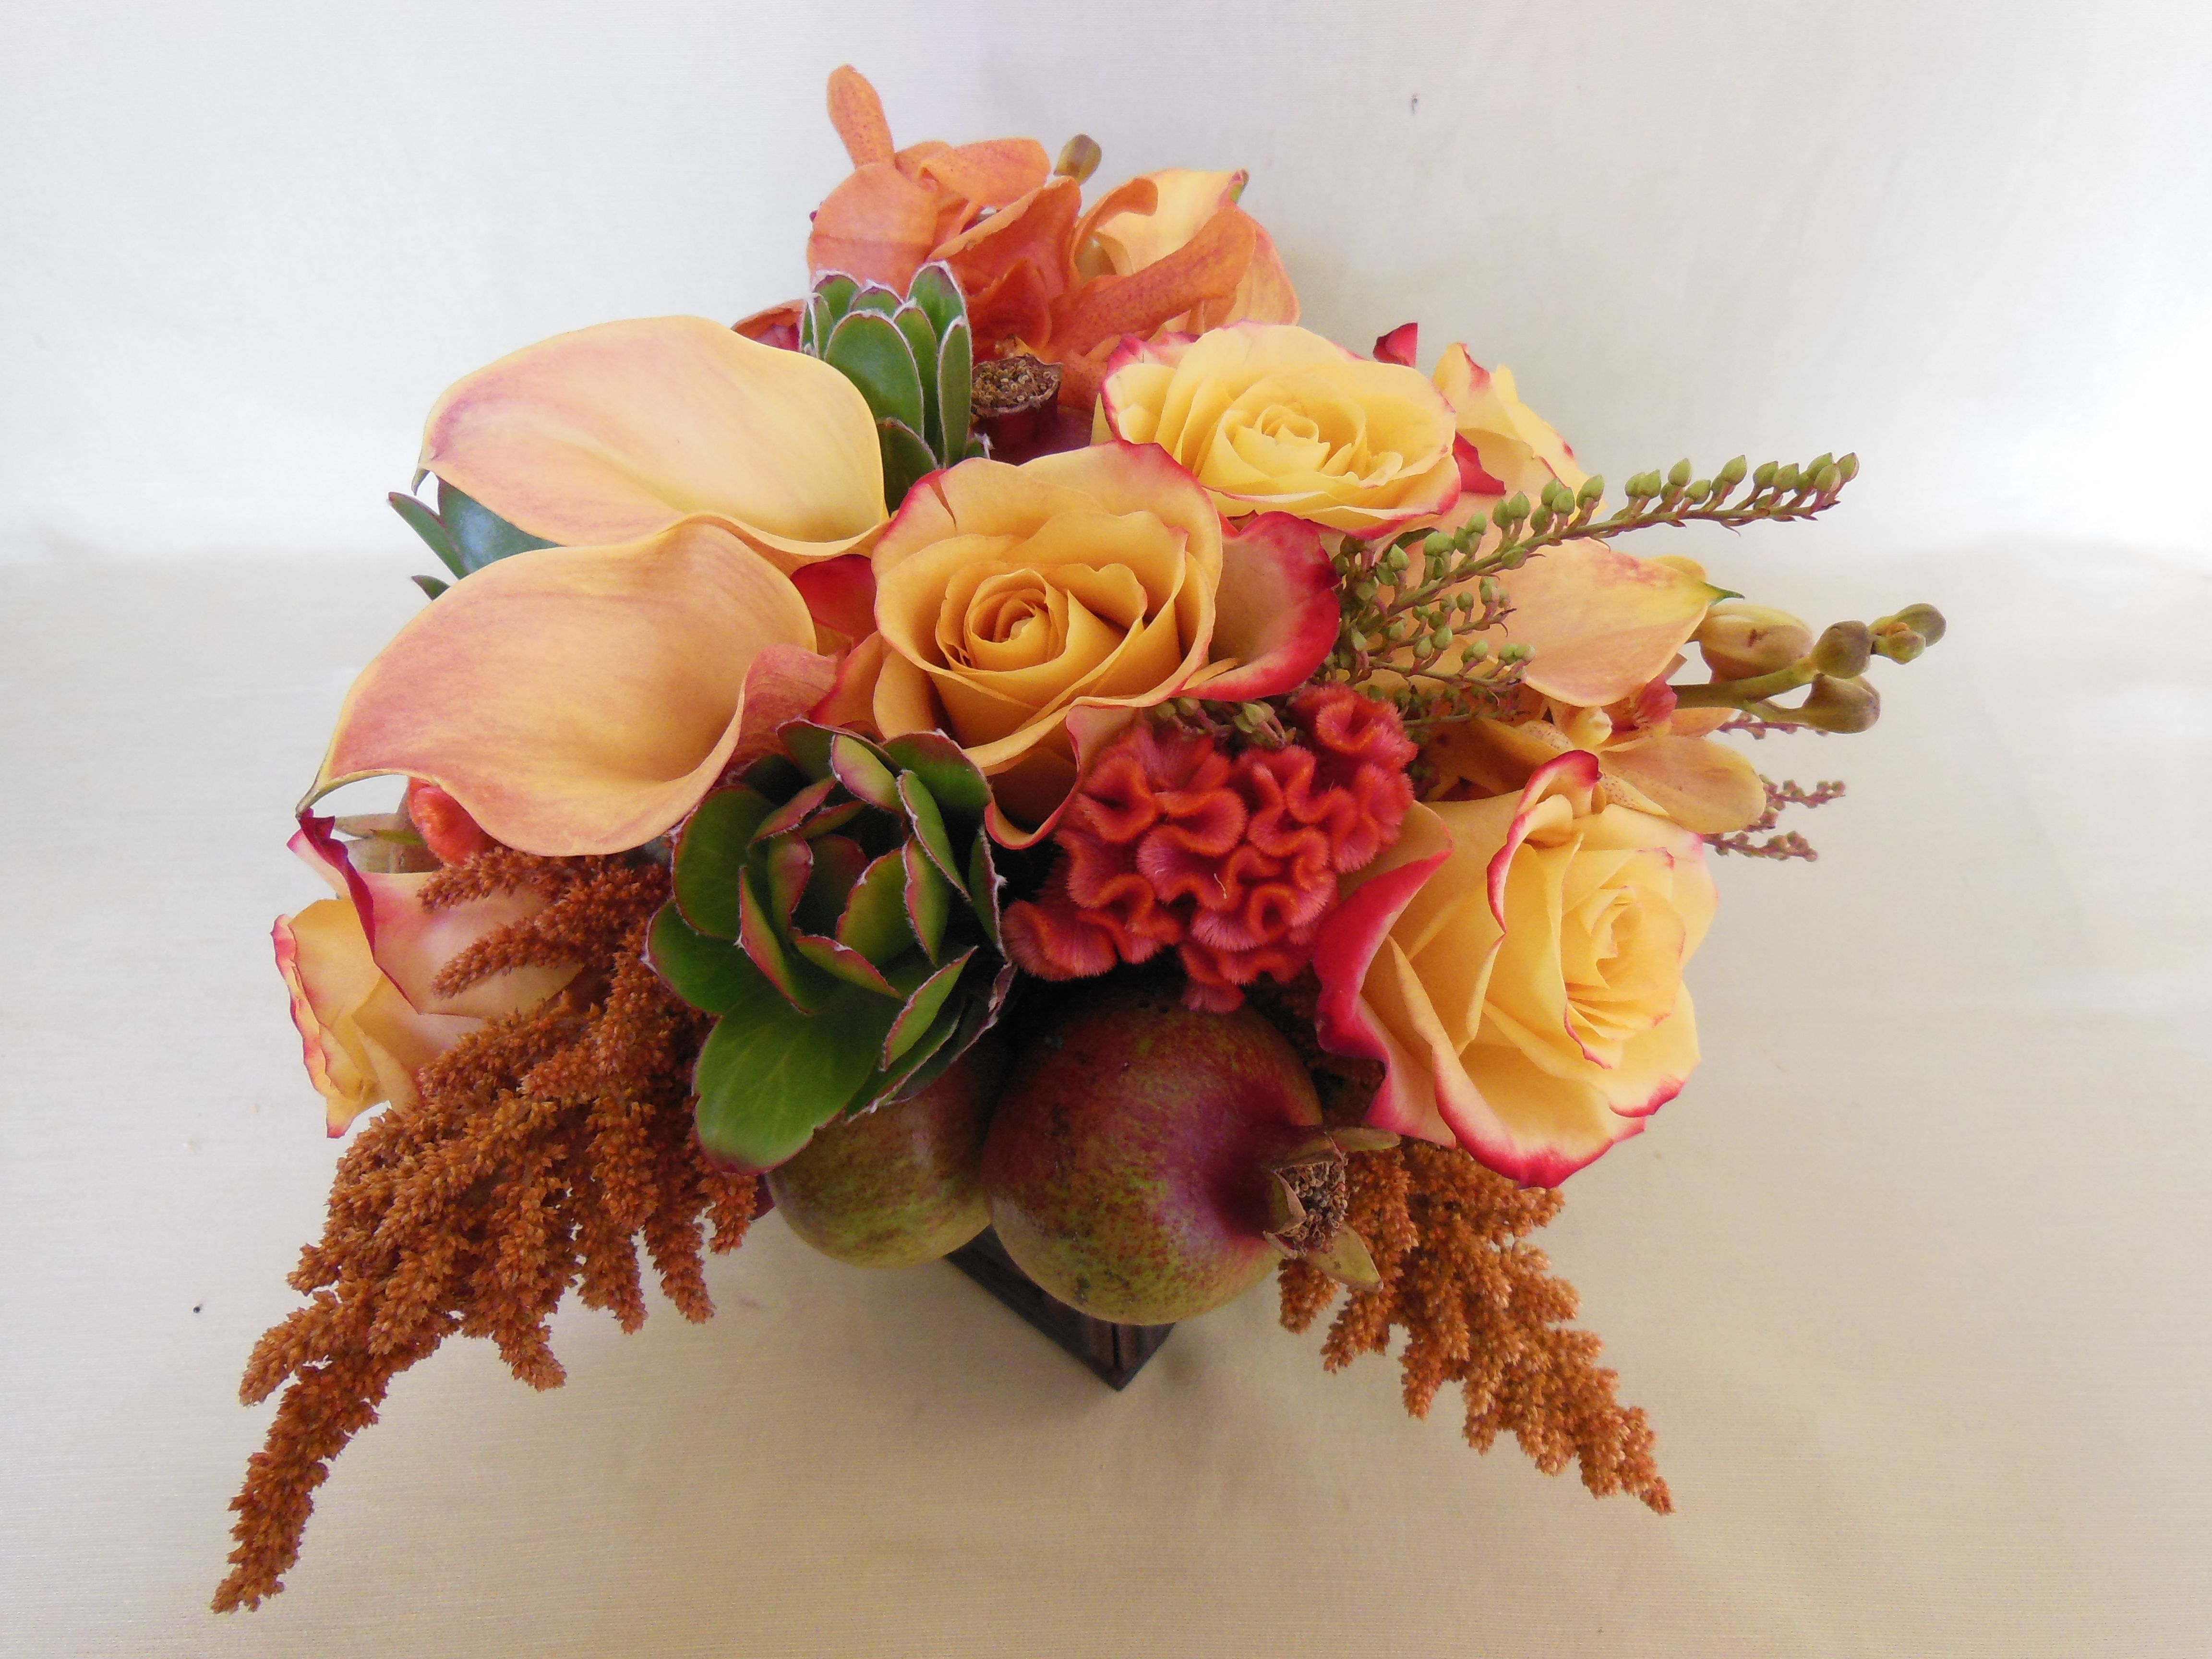 Autumn Harvest Flowers - Bedford Village Florist - Westchester New